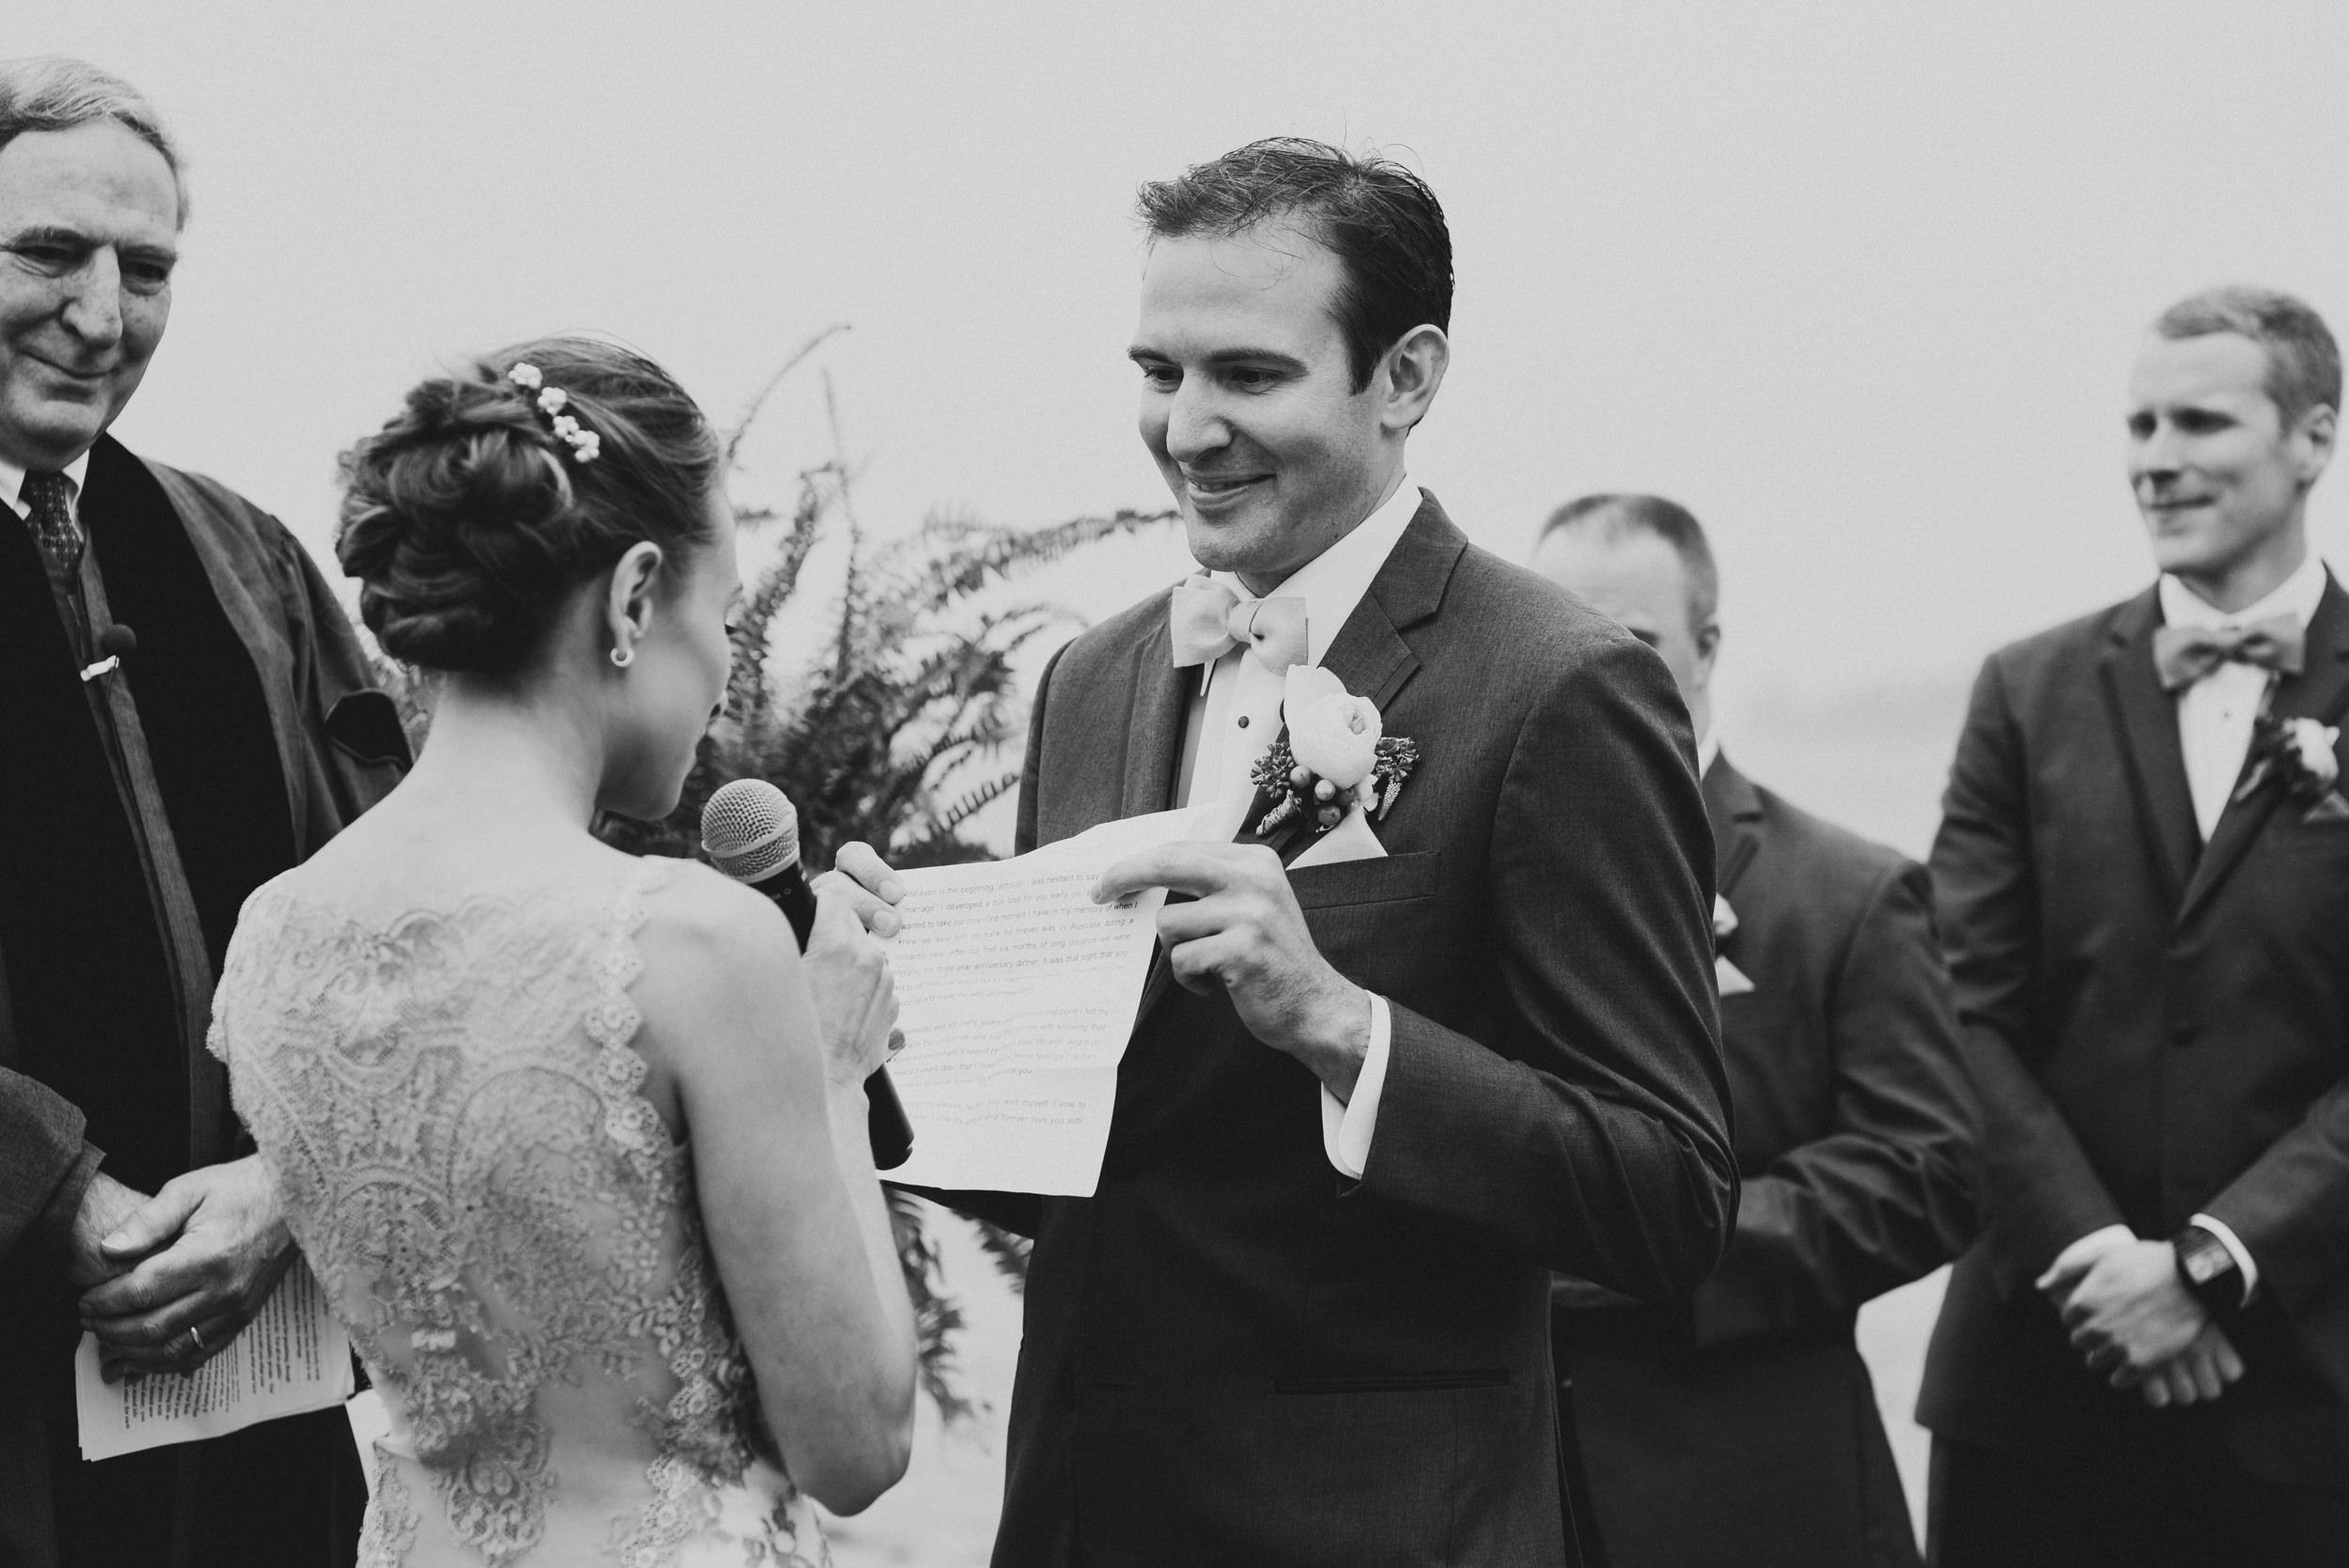 Philip Merrill Environmental Center wedding-15.jpg